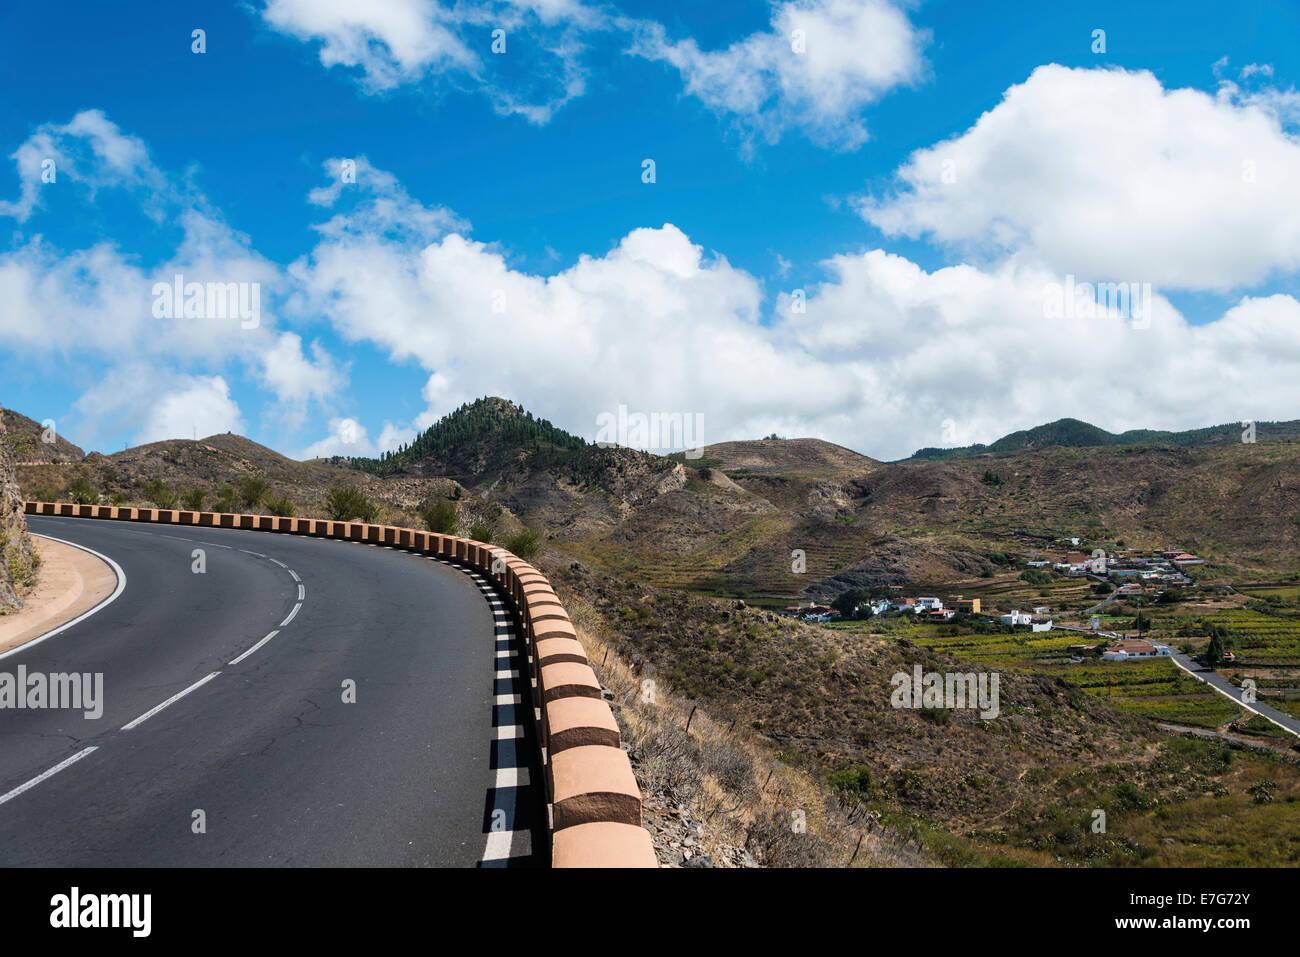 Straße, Santiago del Teide, Teneriffa, Kanarische Inseln, Spanien Stockbild